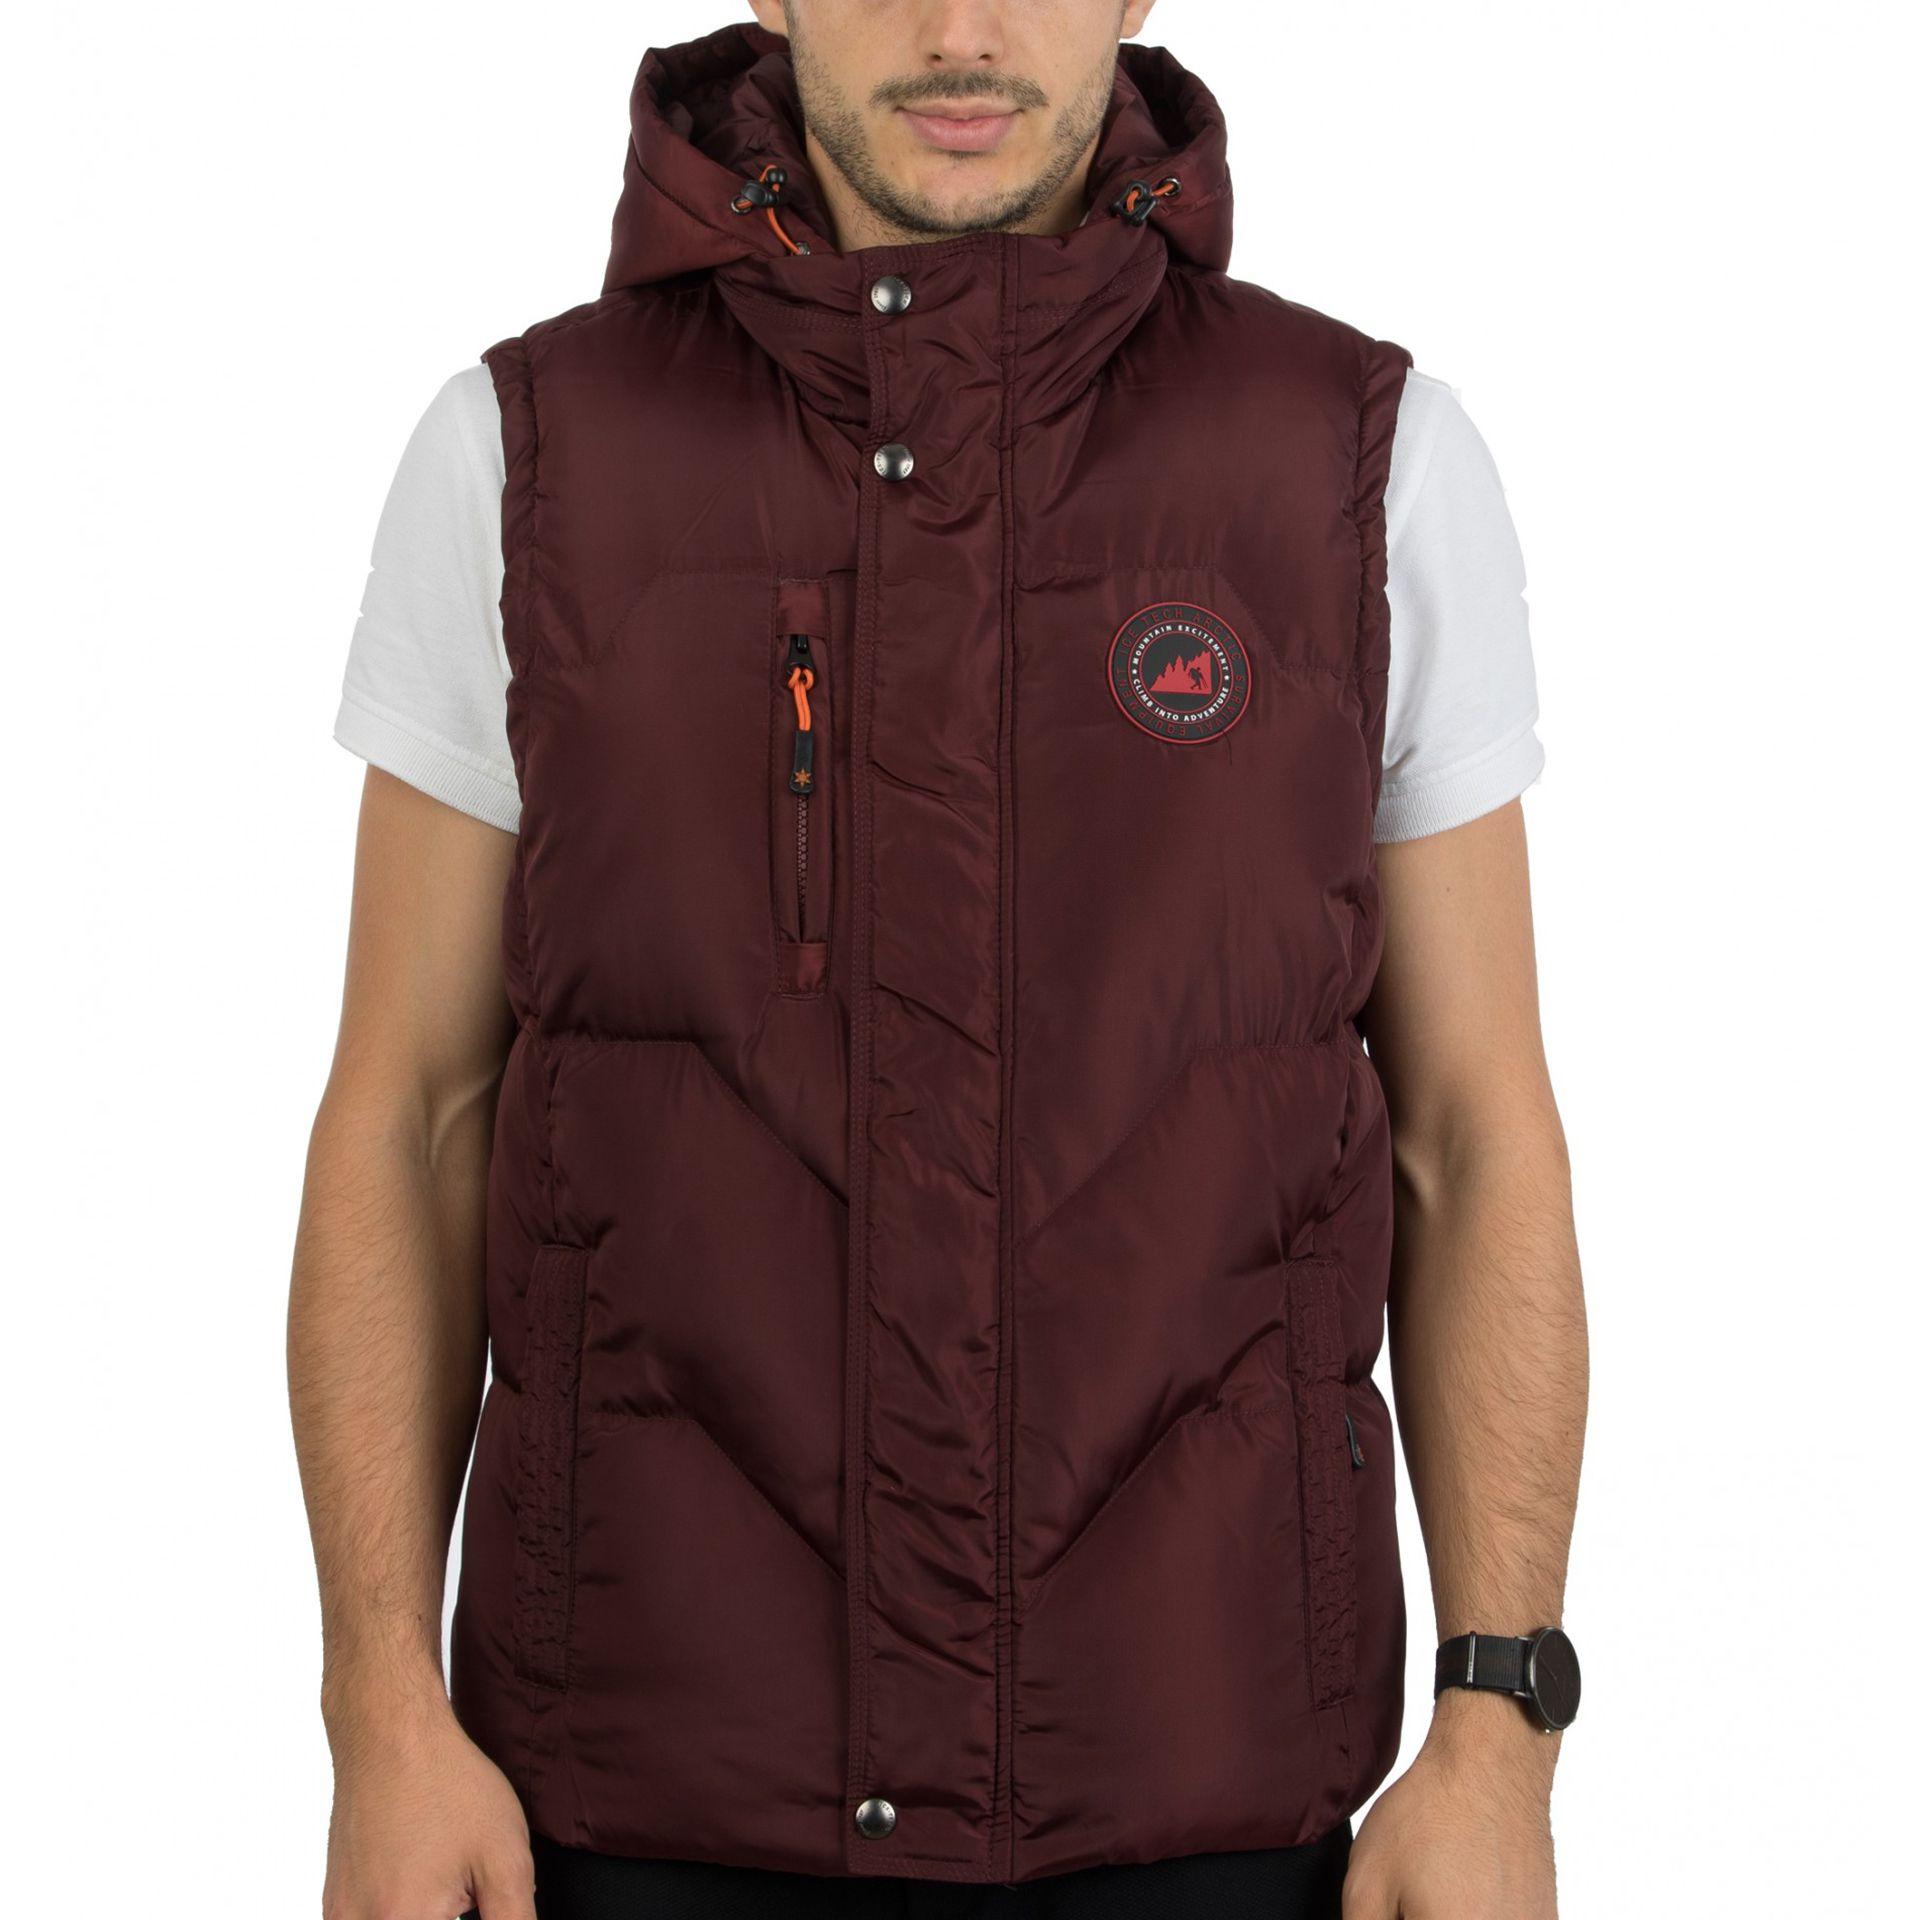 6f8c538a5336 Ανδρικά   Ρούχα   Πανωφόρια   Τζάκετ   Ανδρικό Μπουφάν Jacket ...